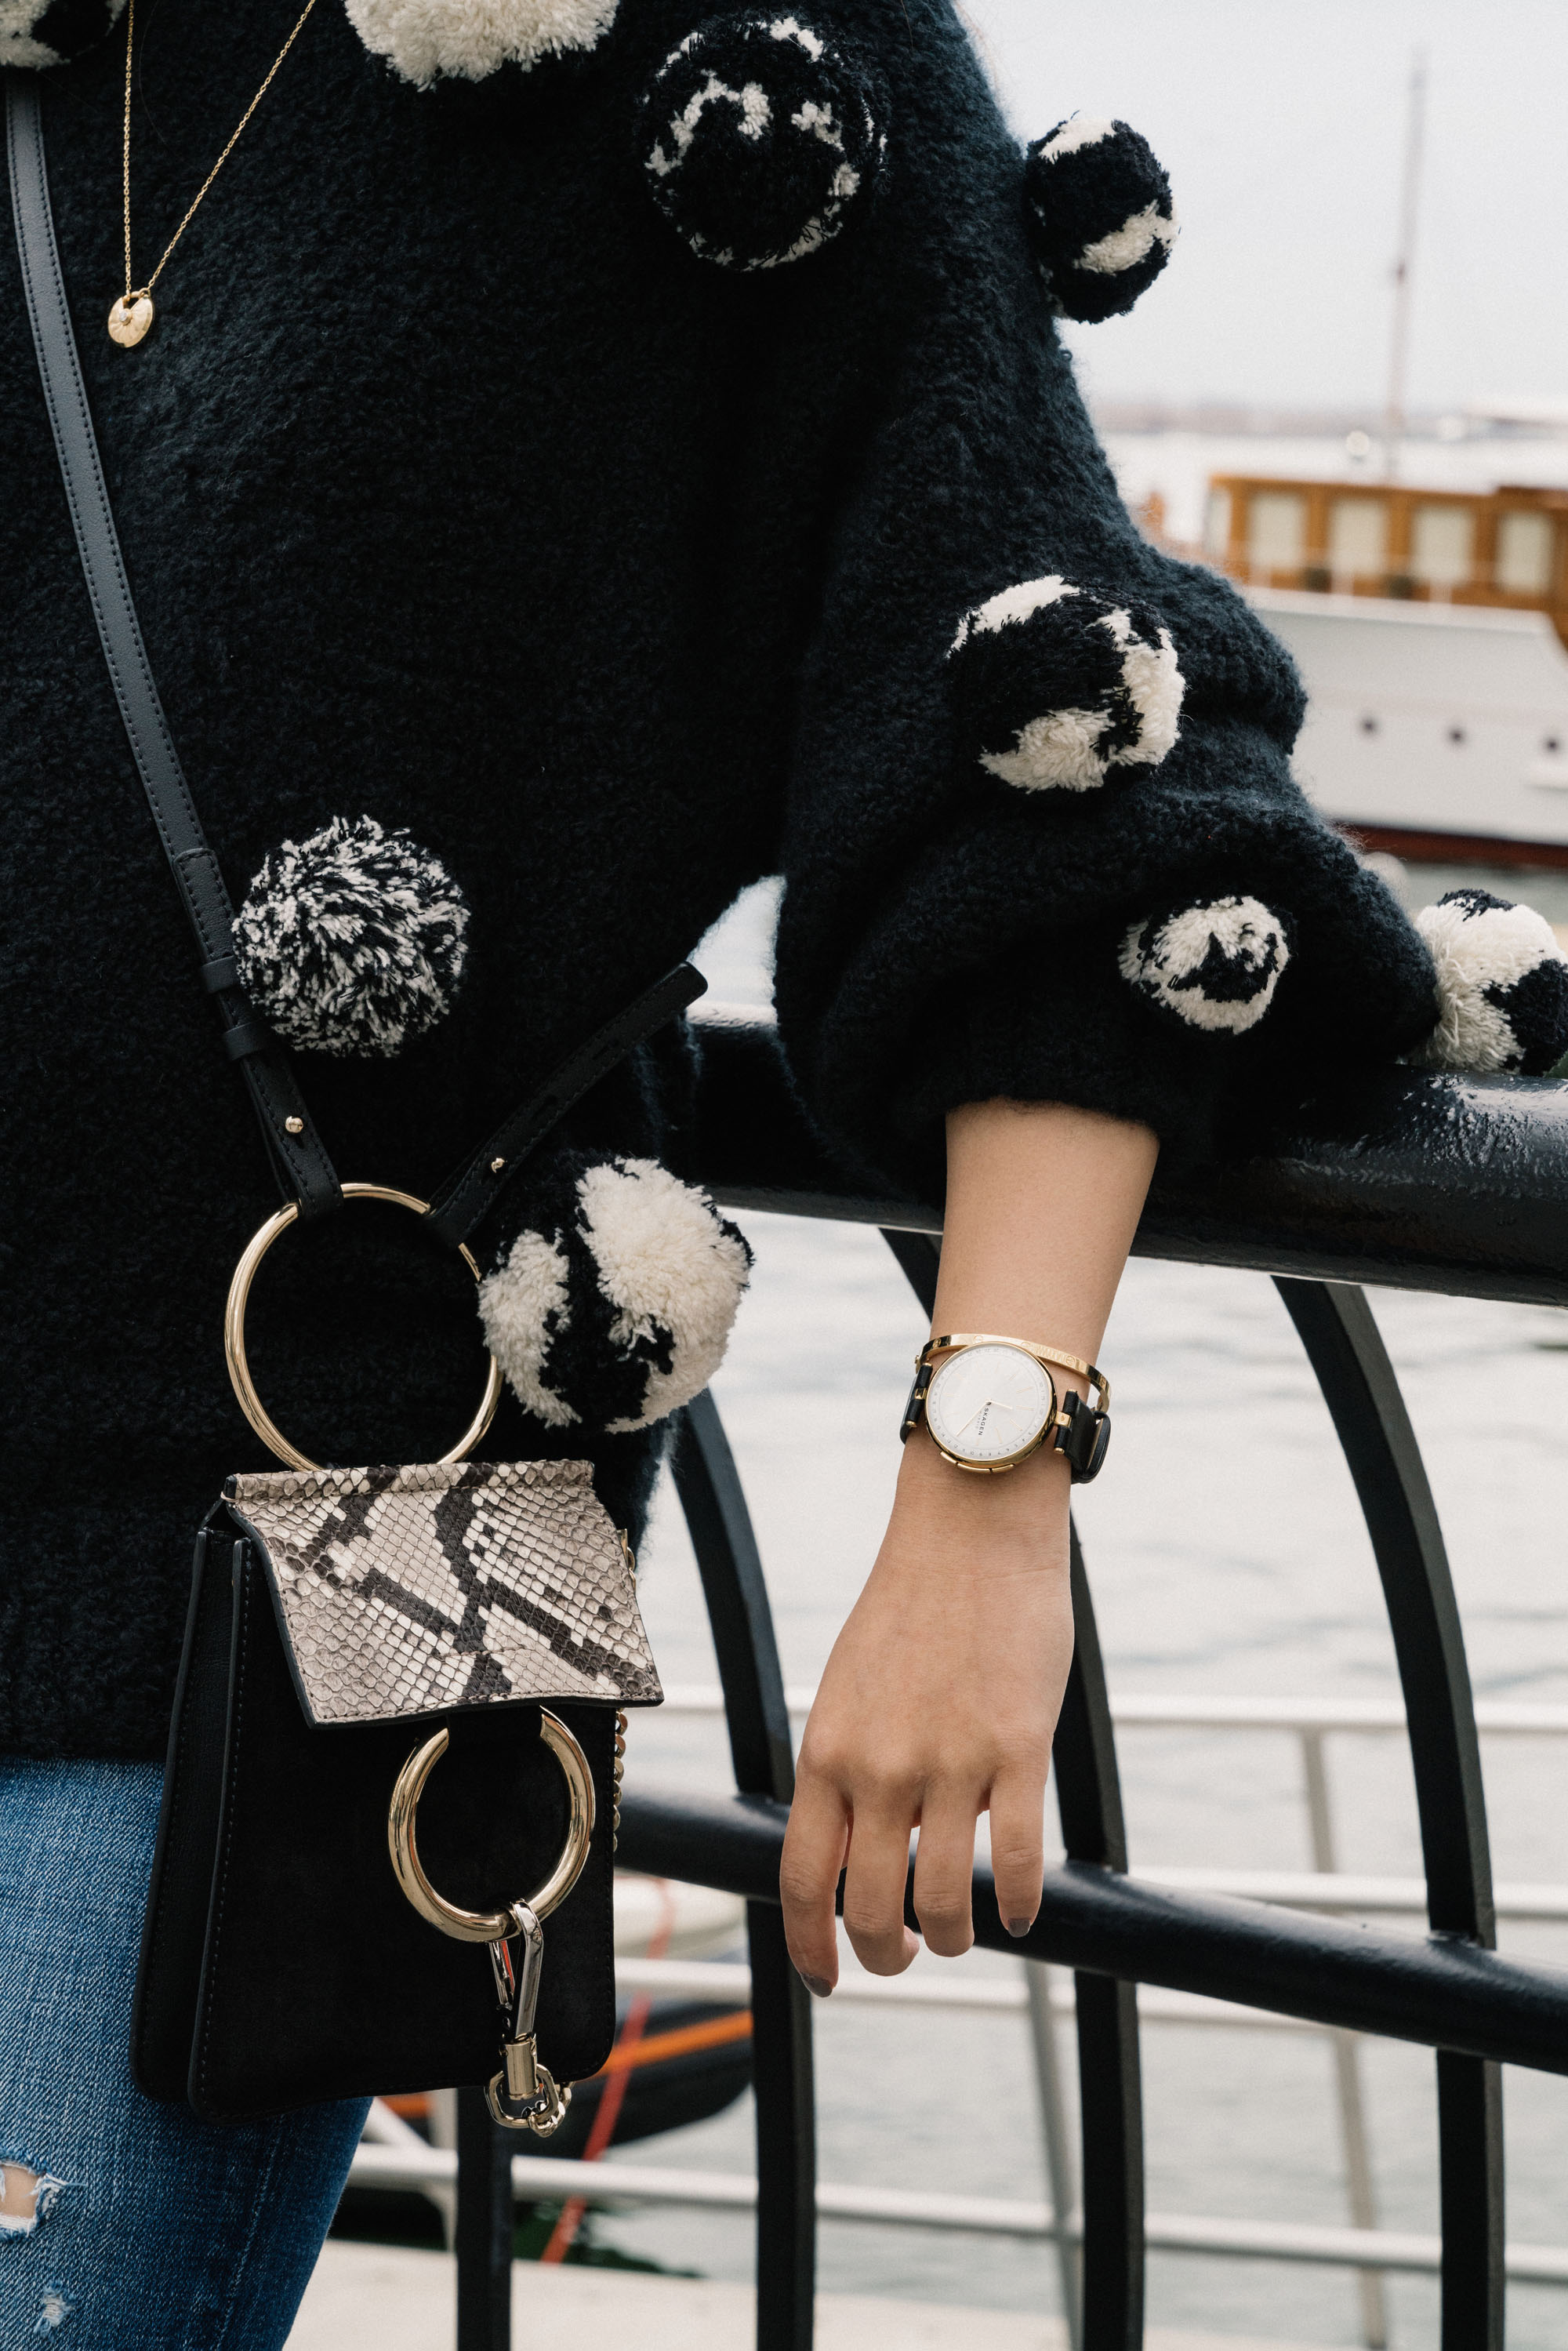 Spencer Vladimir Sweater,  Moussy Denim , Chloé Bag,  Skagen Watch ,  Cartier Bracelet